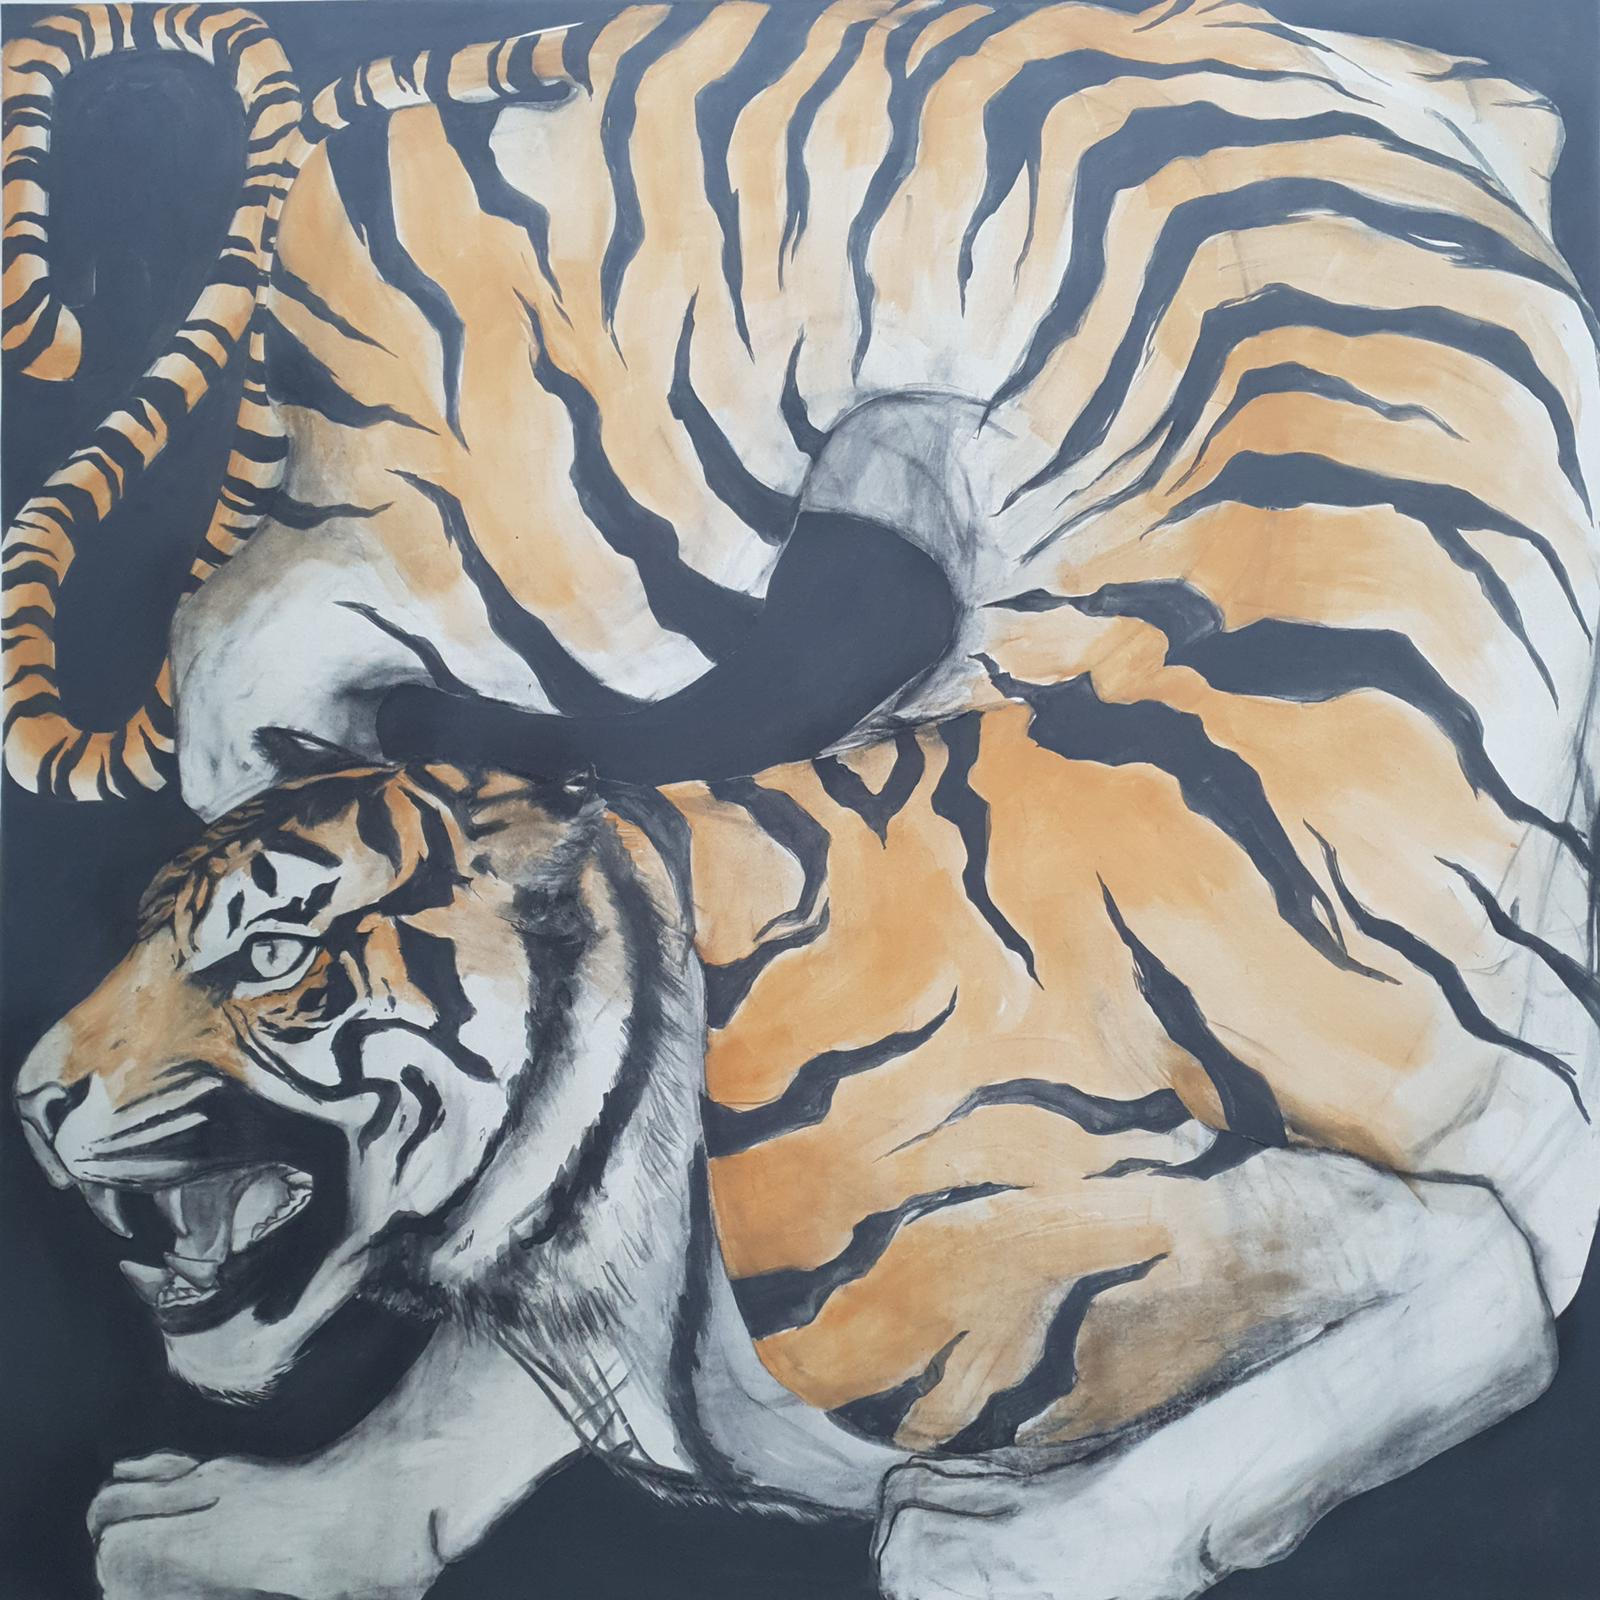 Zimbiri (b. 1991) Boxed 5, 2020 Saa-tshen on Rhay-shing (Earth paint on canvas) Signed 147 x 147 cm 58 x 58 in